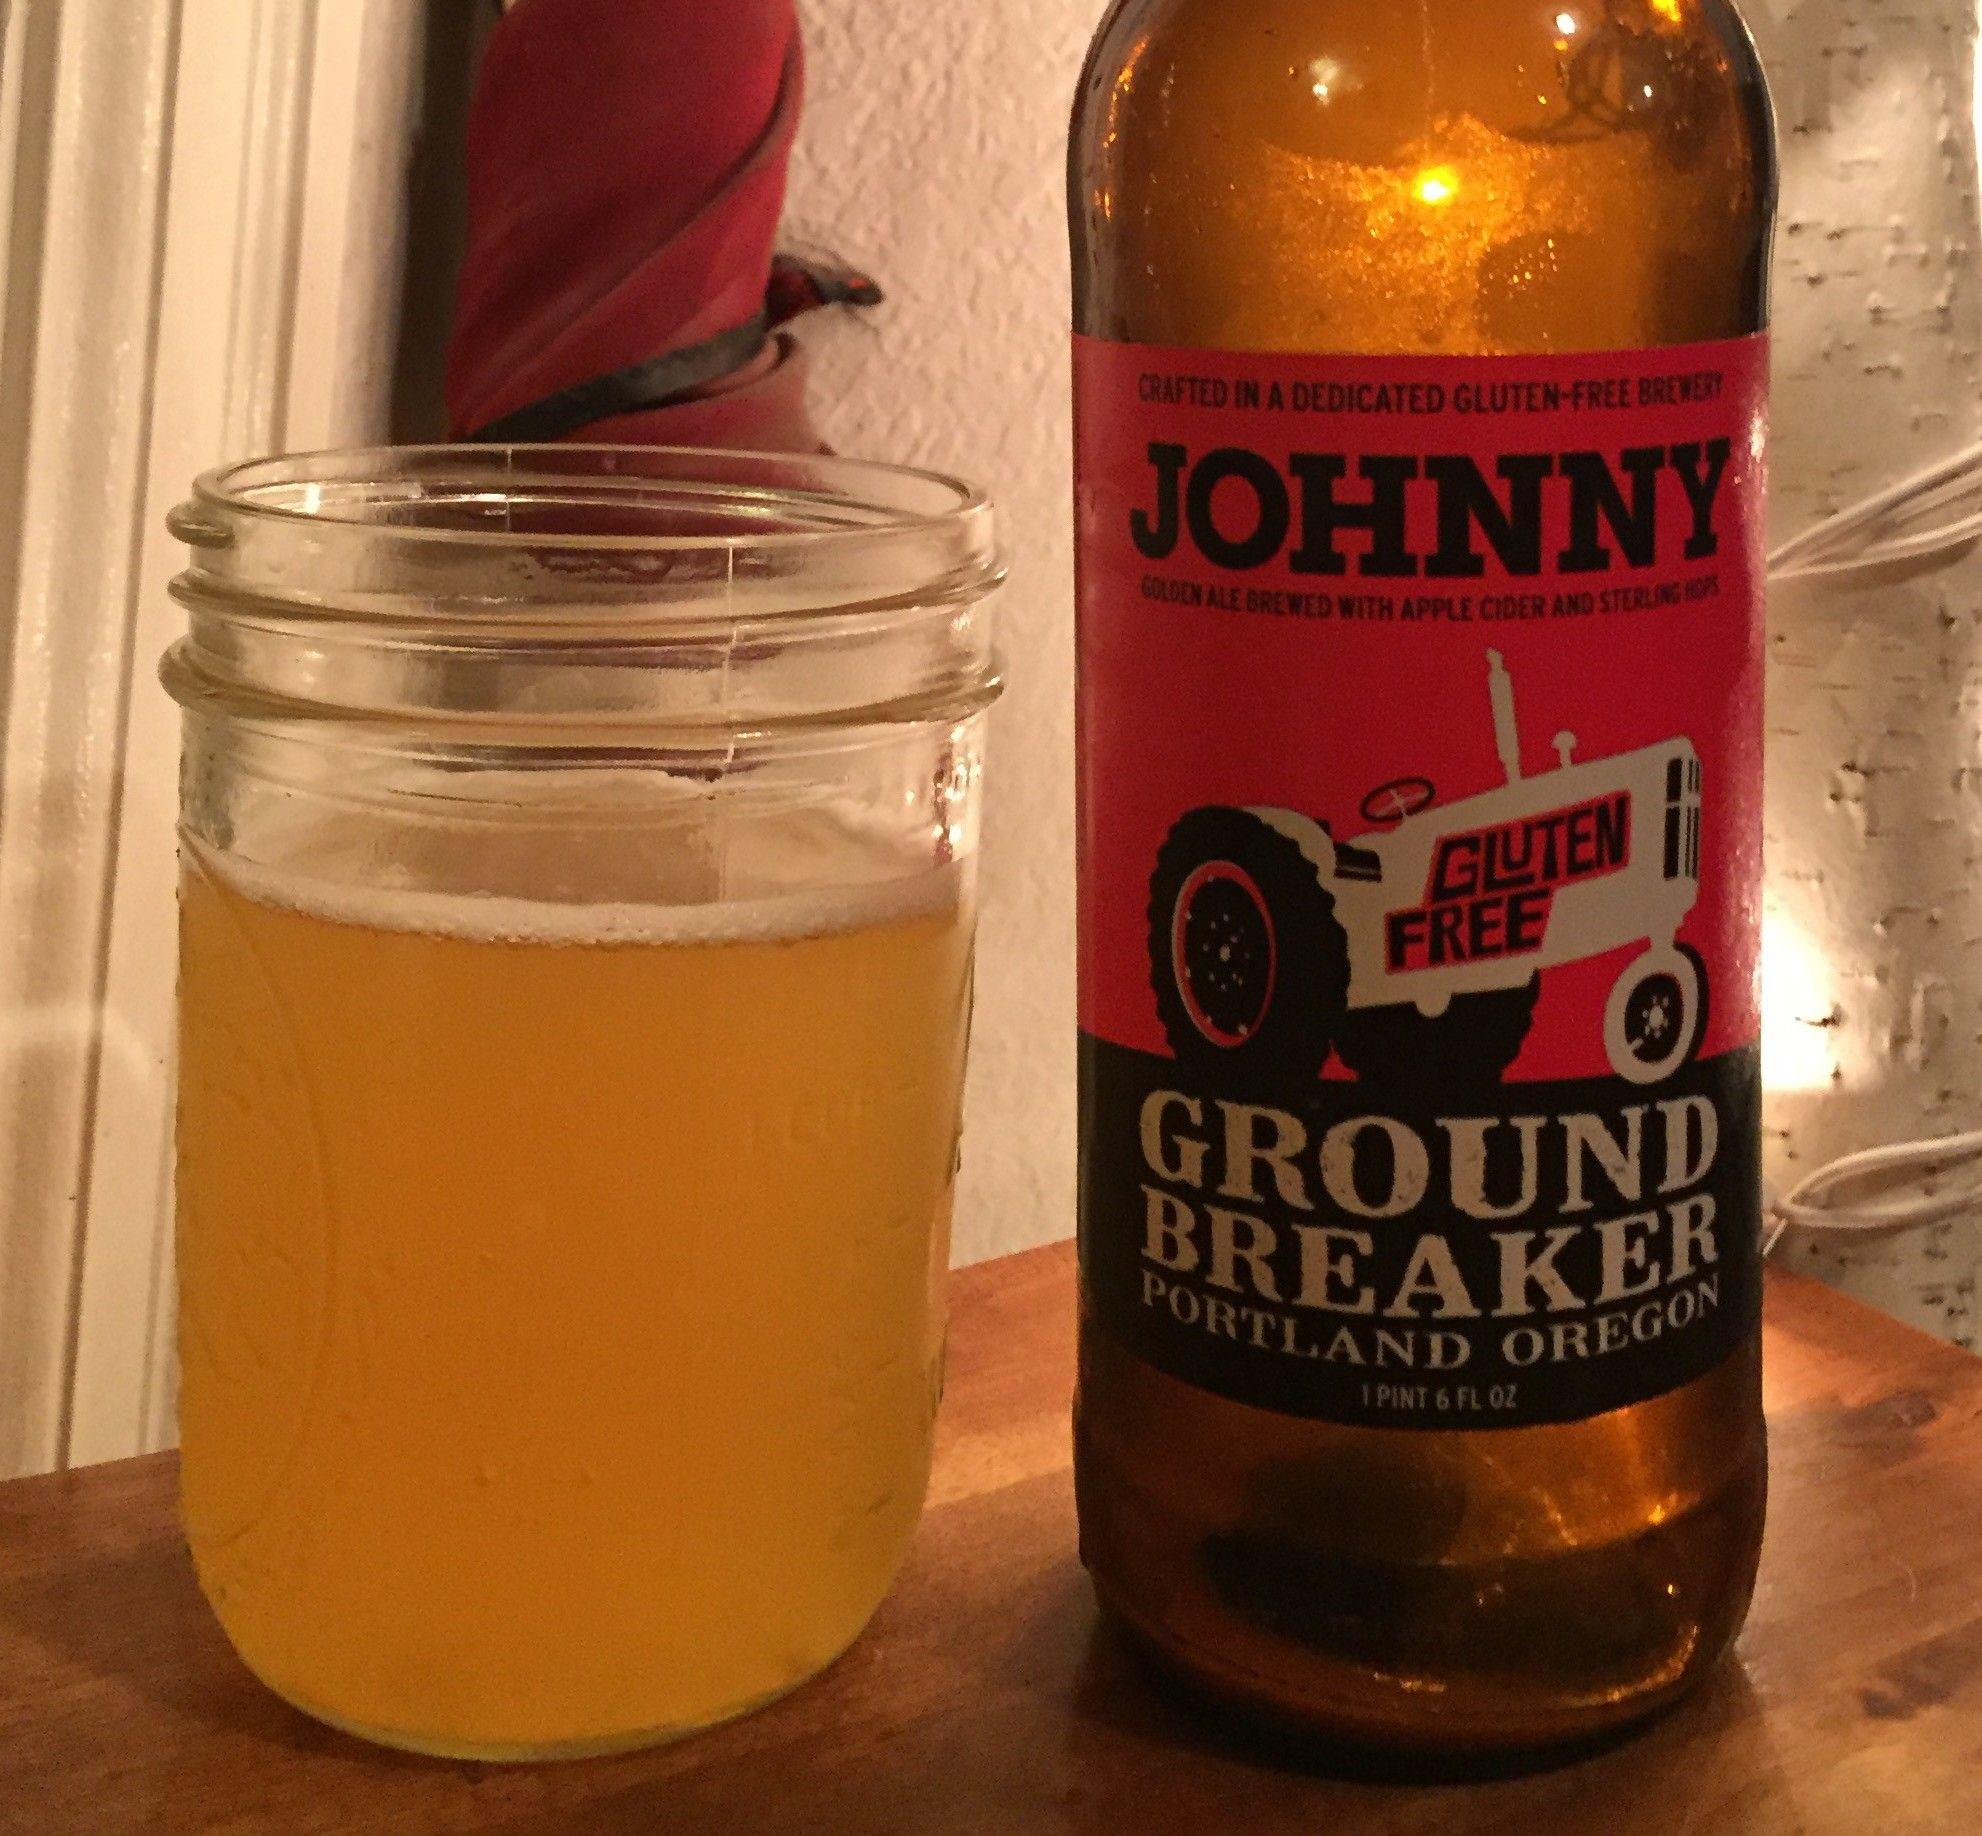 gluten free beer review ground breaker johnny golden ale portland gluten free brewery best gluten free beers